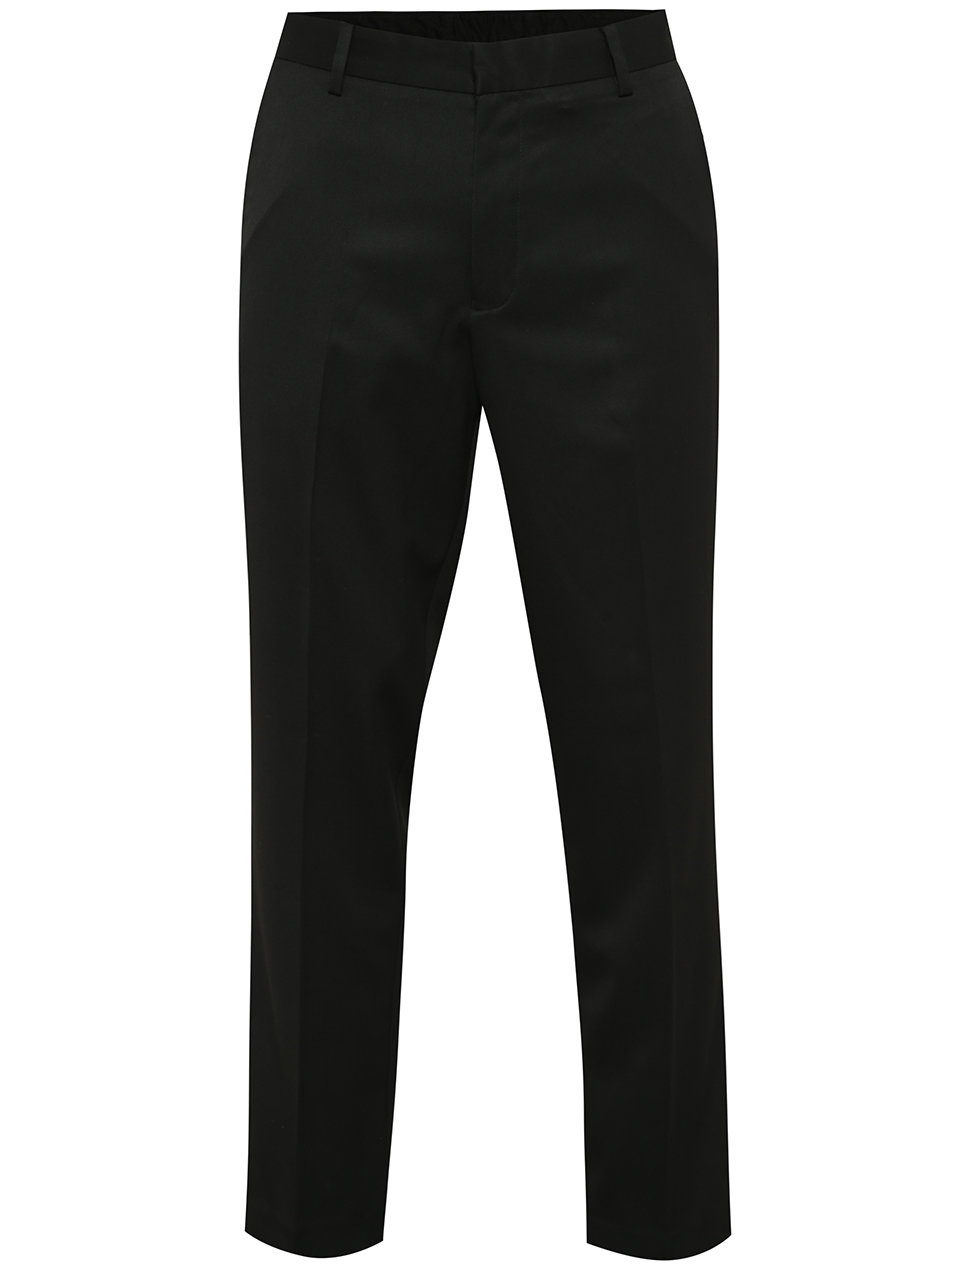 421d7a3fe Čierne formálne regular fit nohavice Burton Menswear London | ZOOT.sk